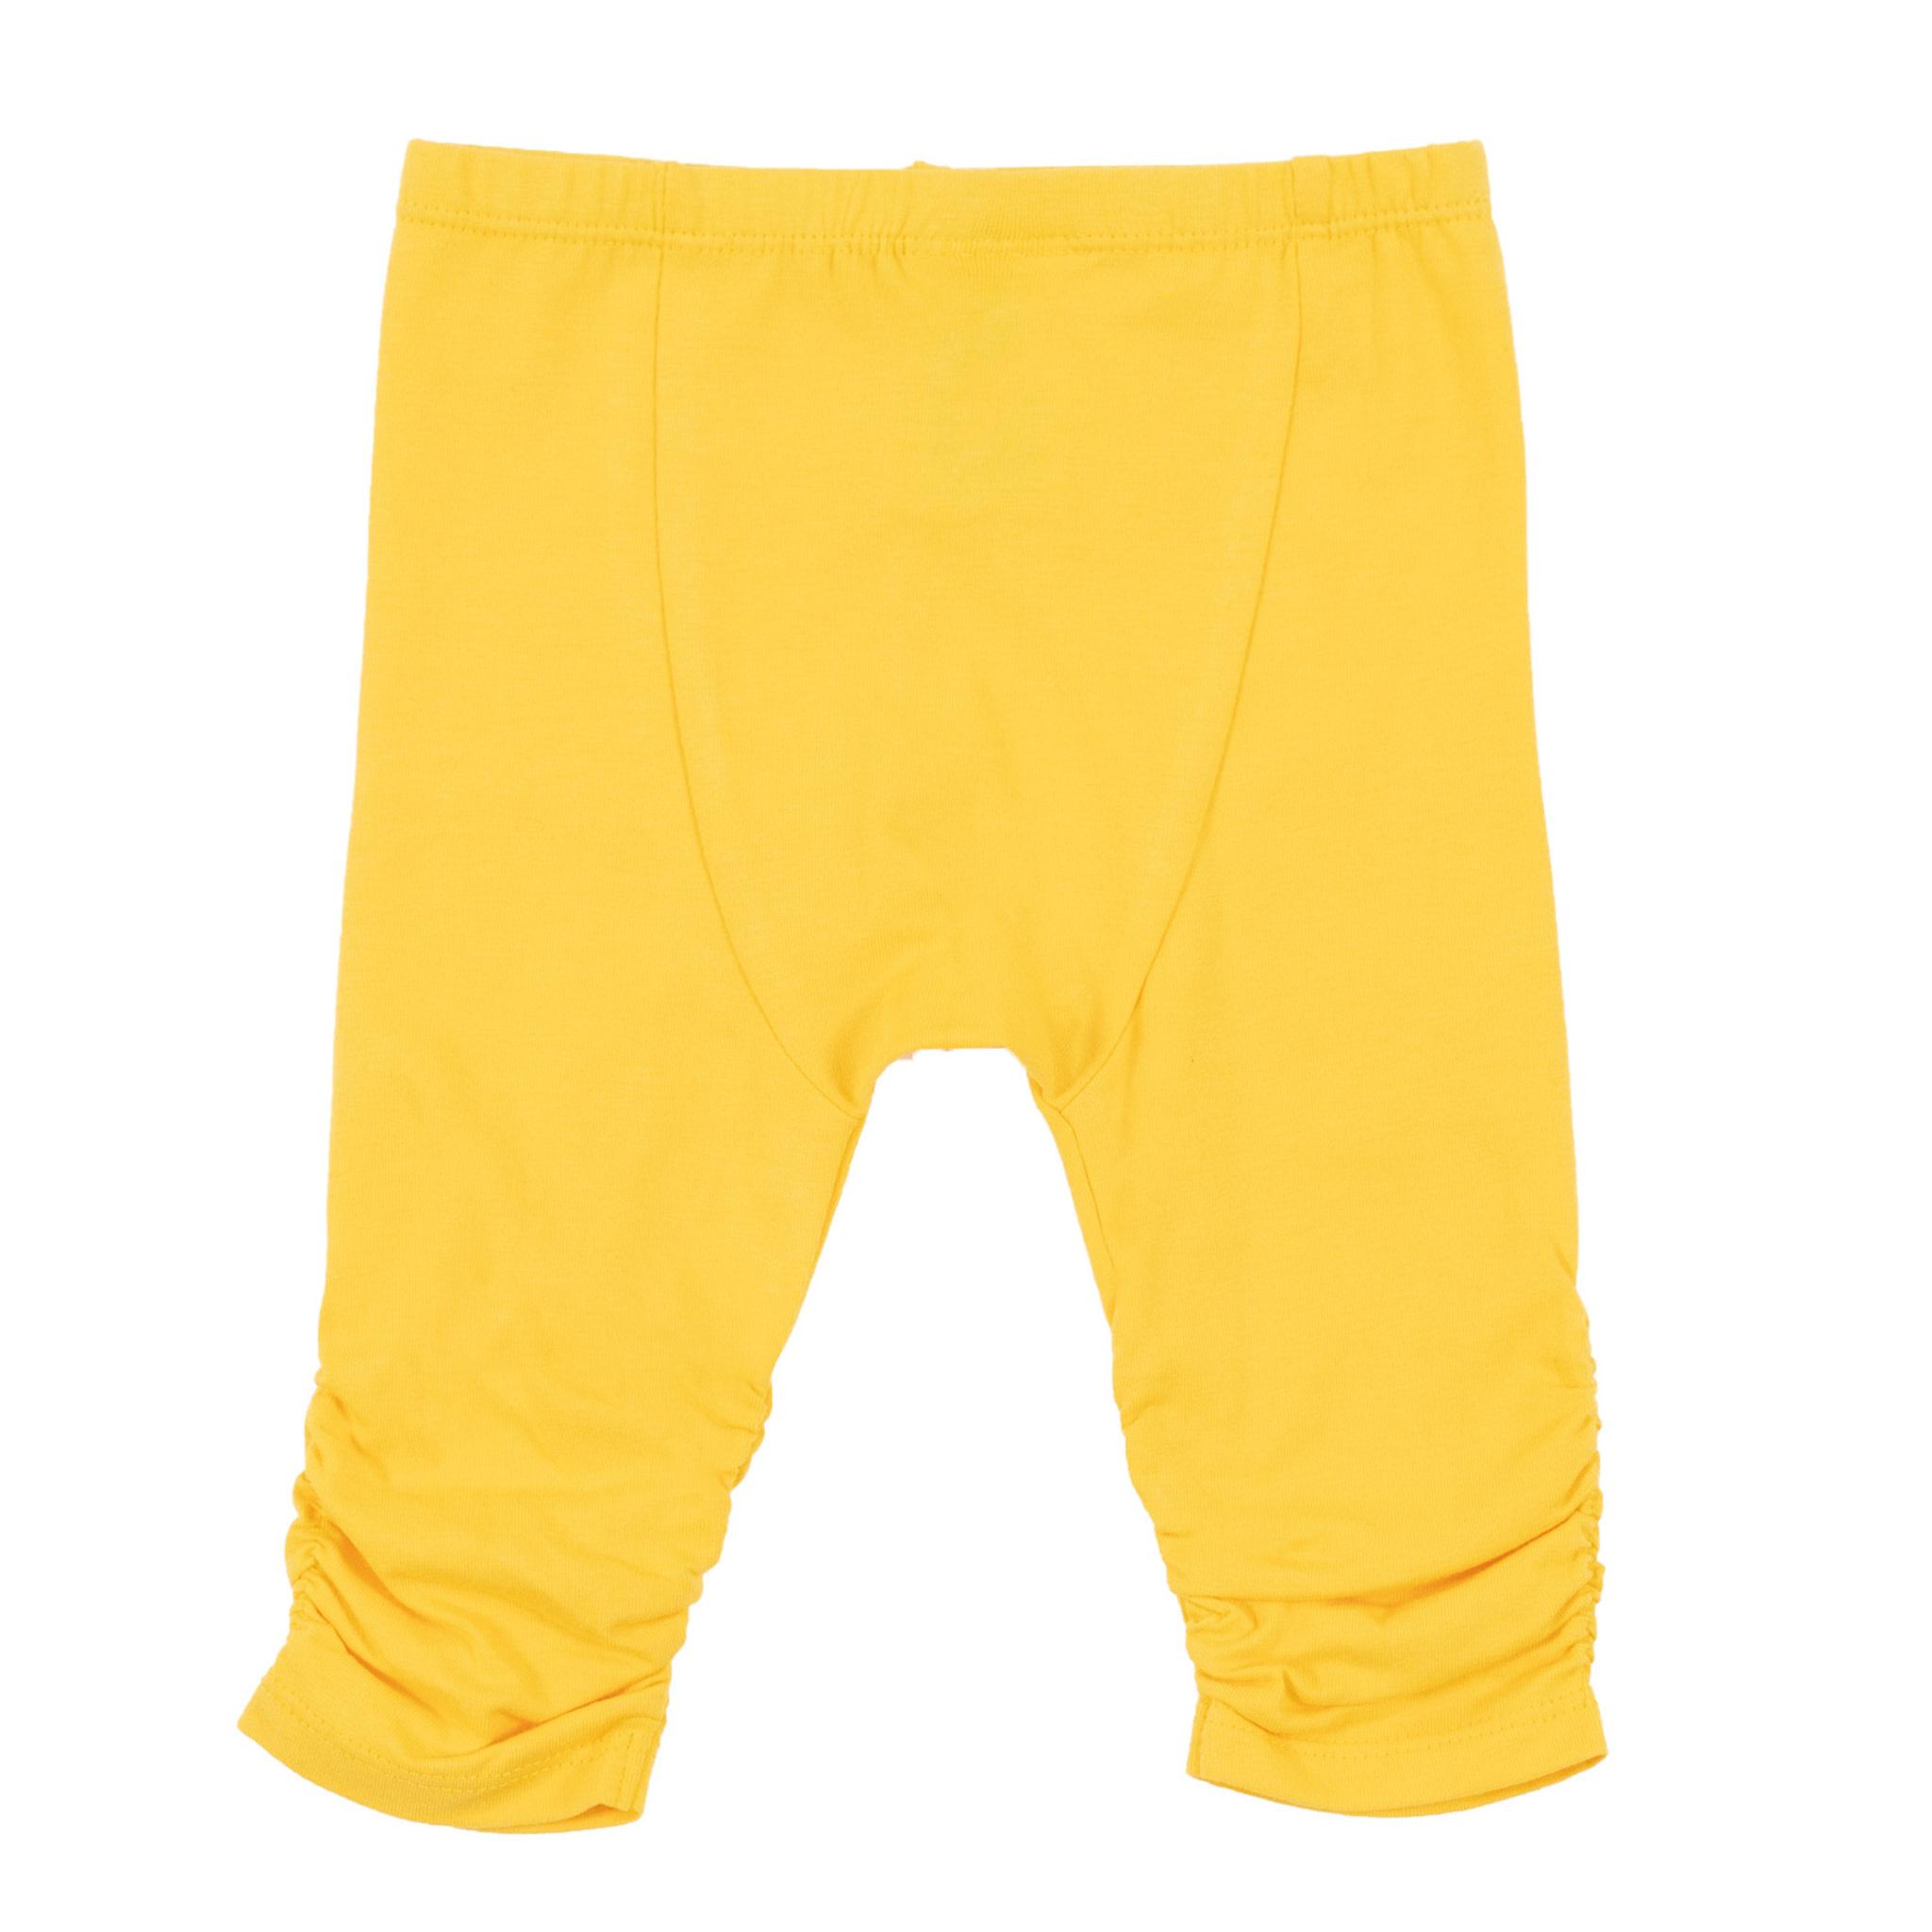 Legging 3/4 jaune Rayon de soleil-2